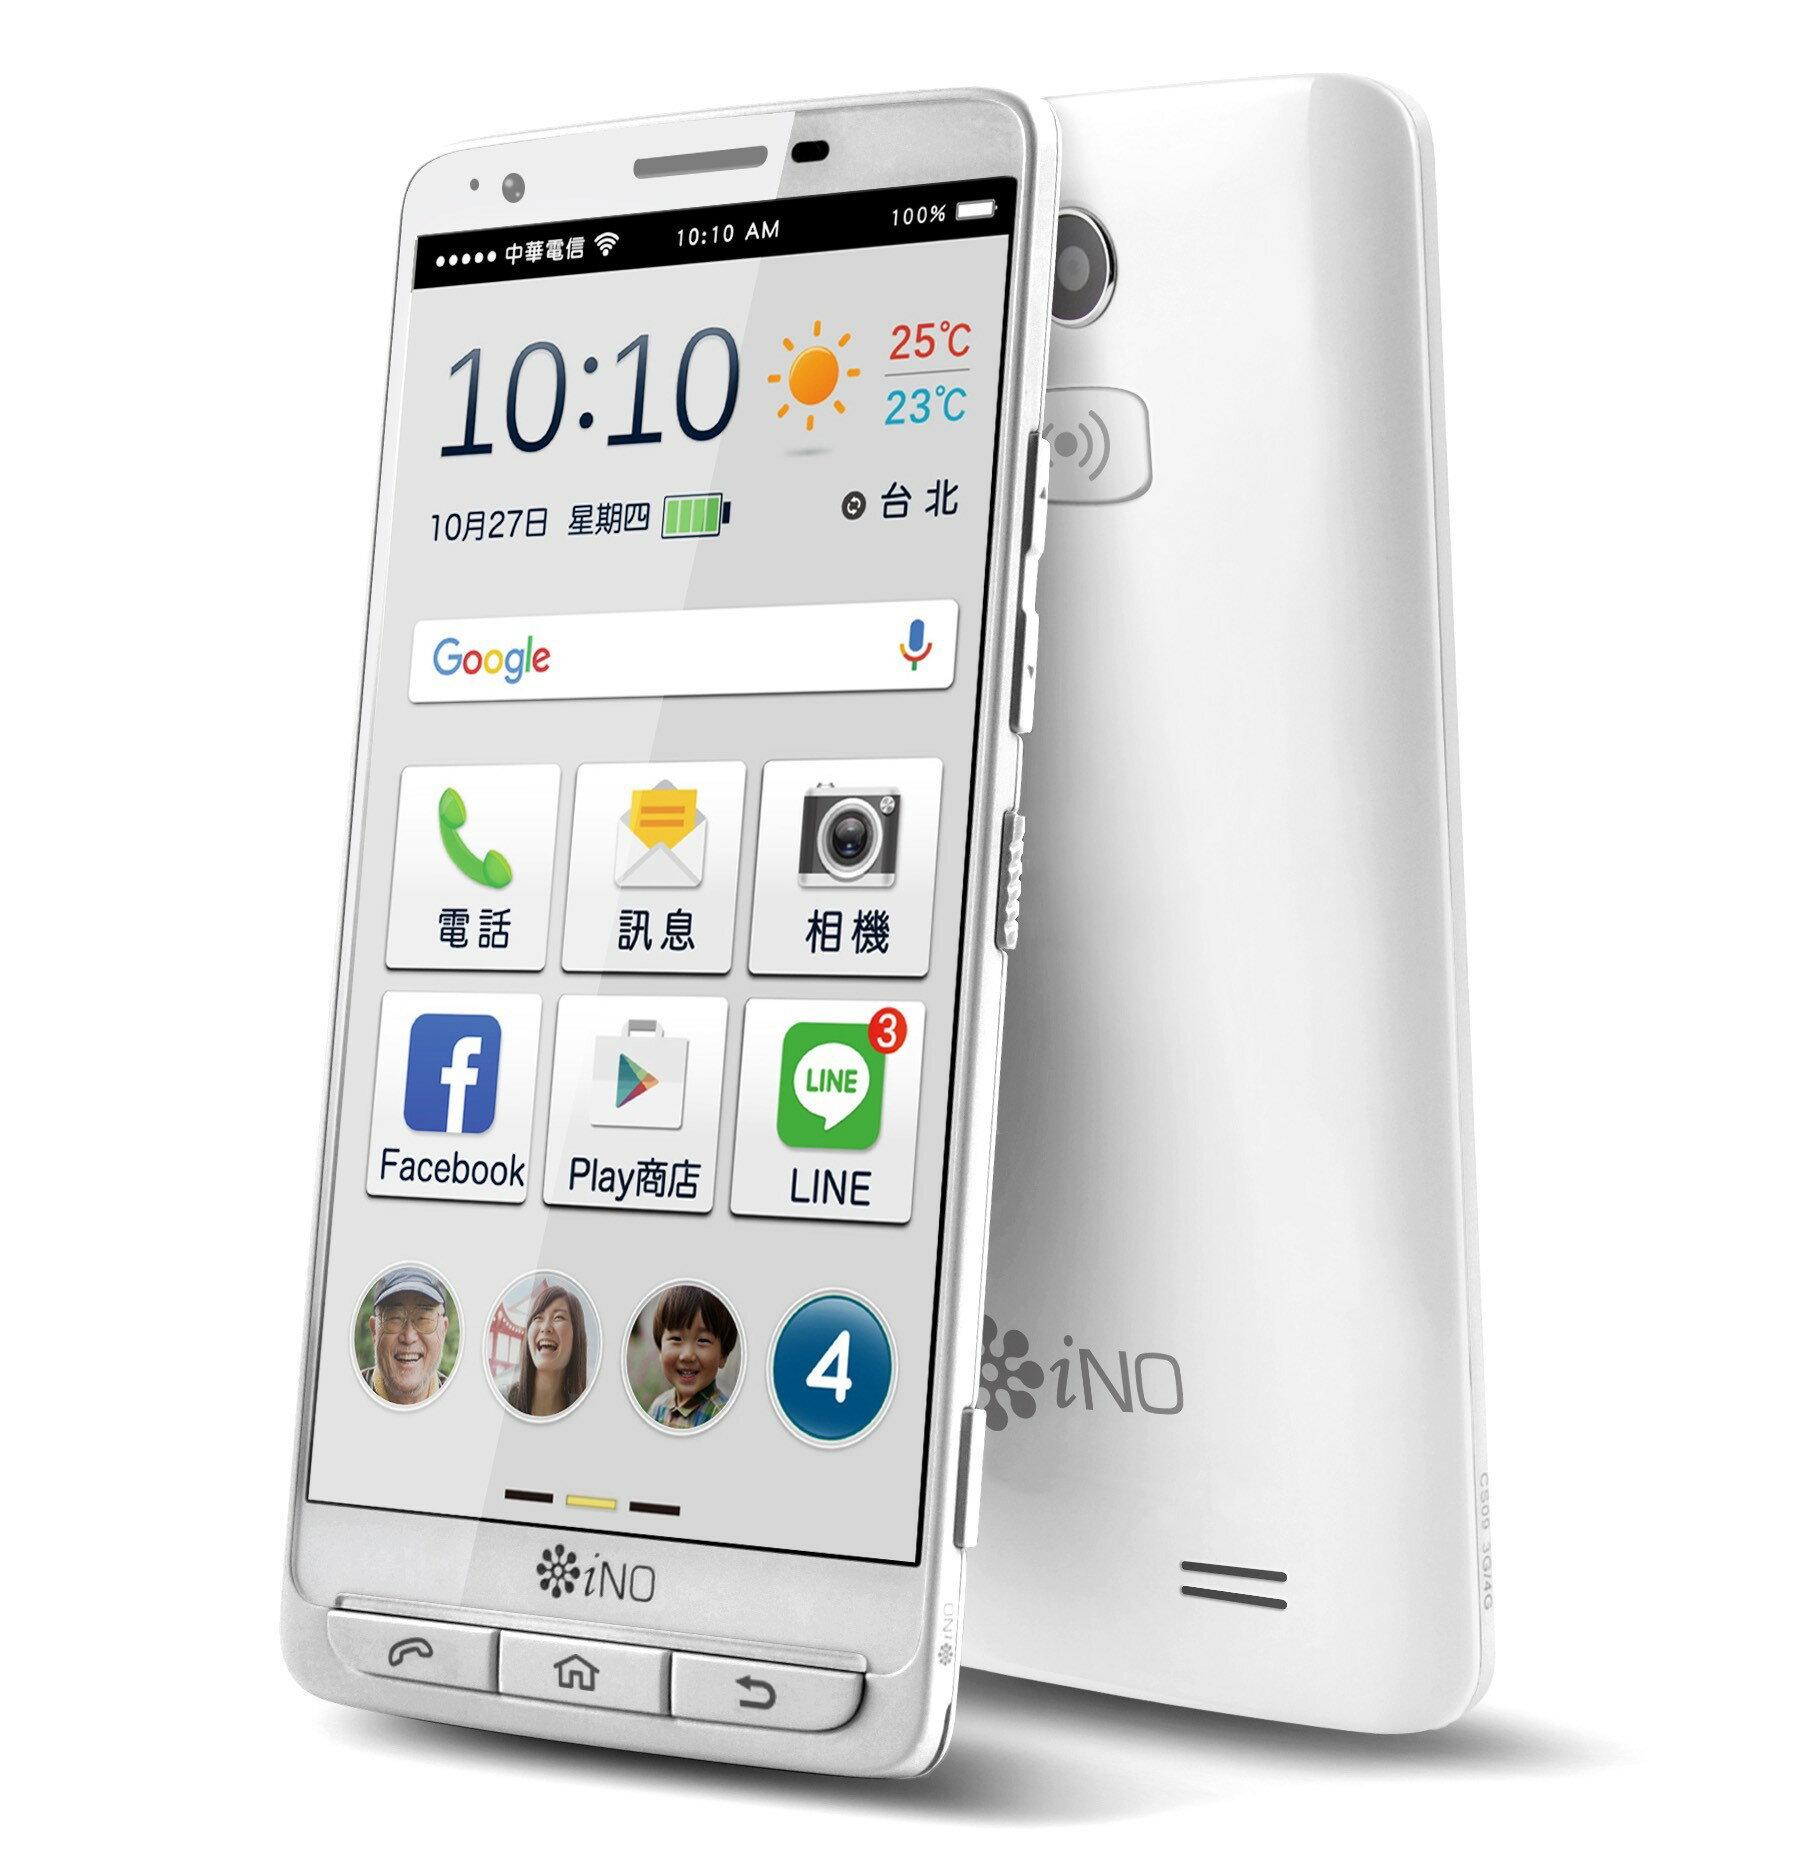 iNO S9 銀髮族 智慧型 5.5吋 大鈴聲 撥號 老人機 支援高畫素相機 操作介面簡單